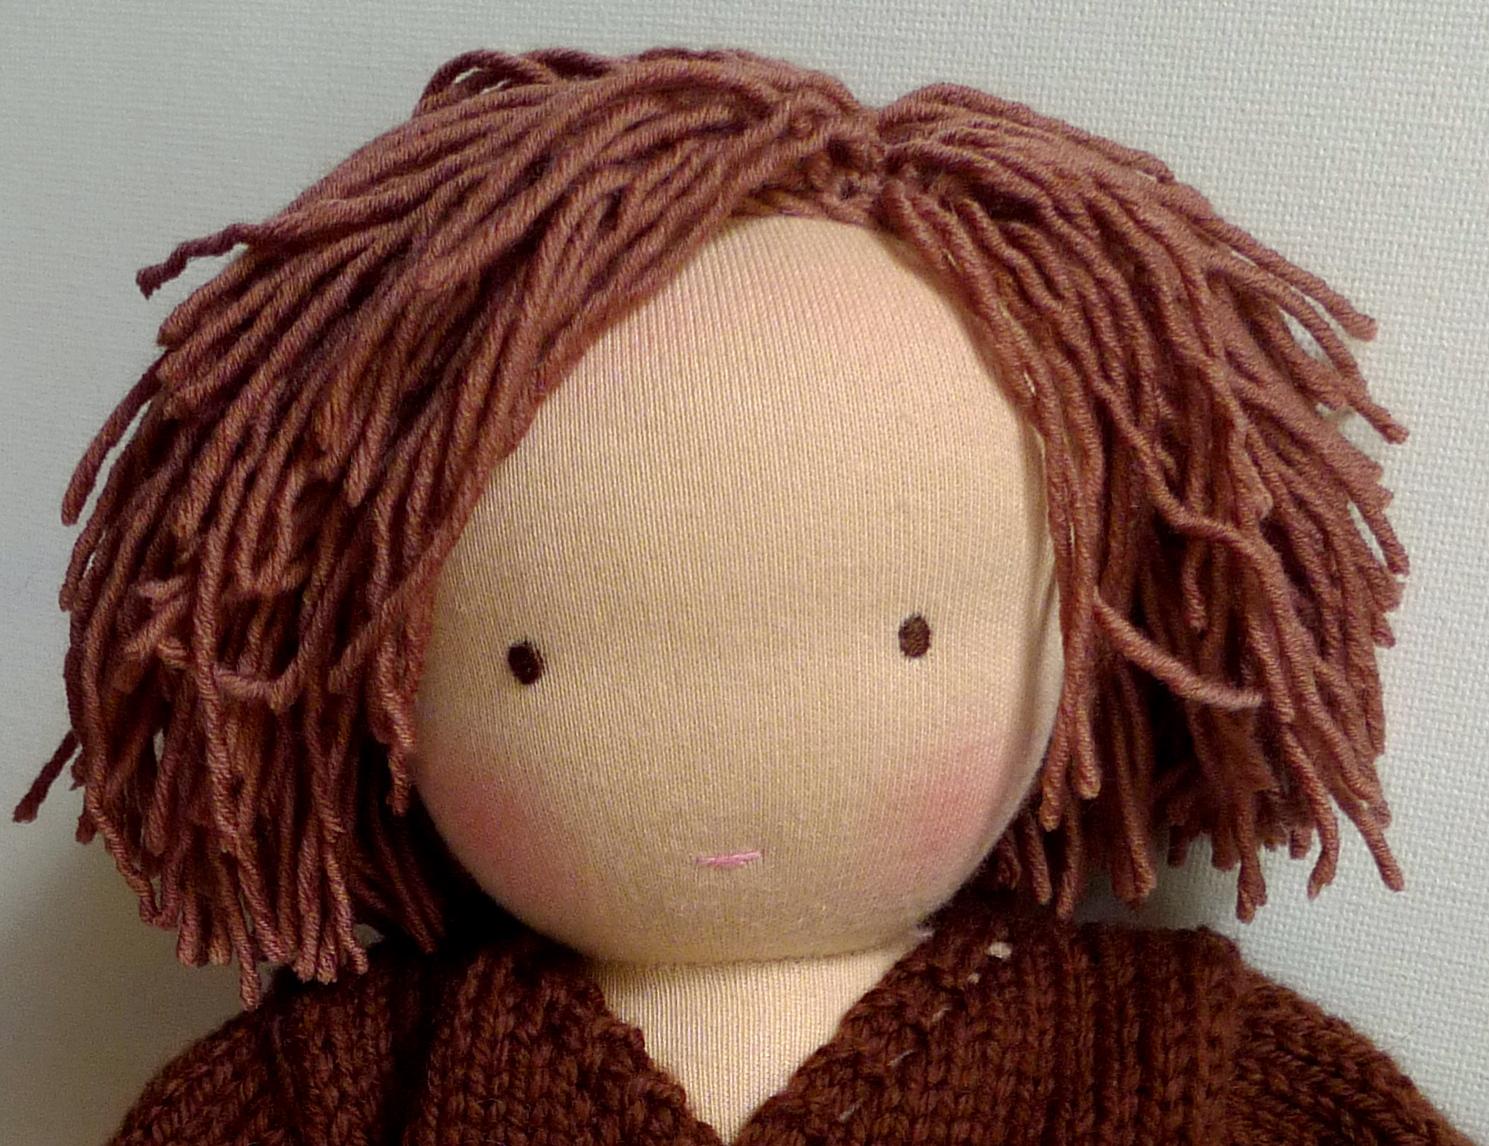 Melissa's doll